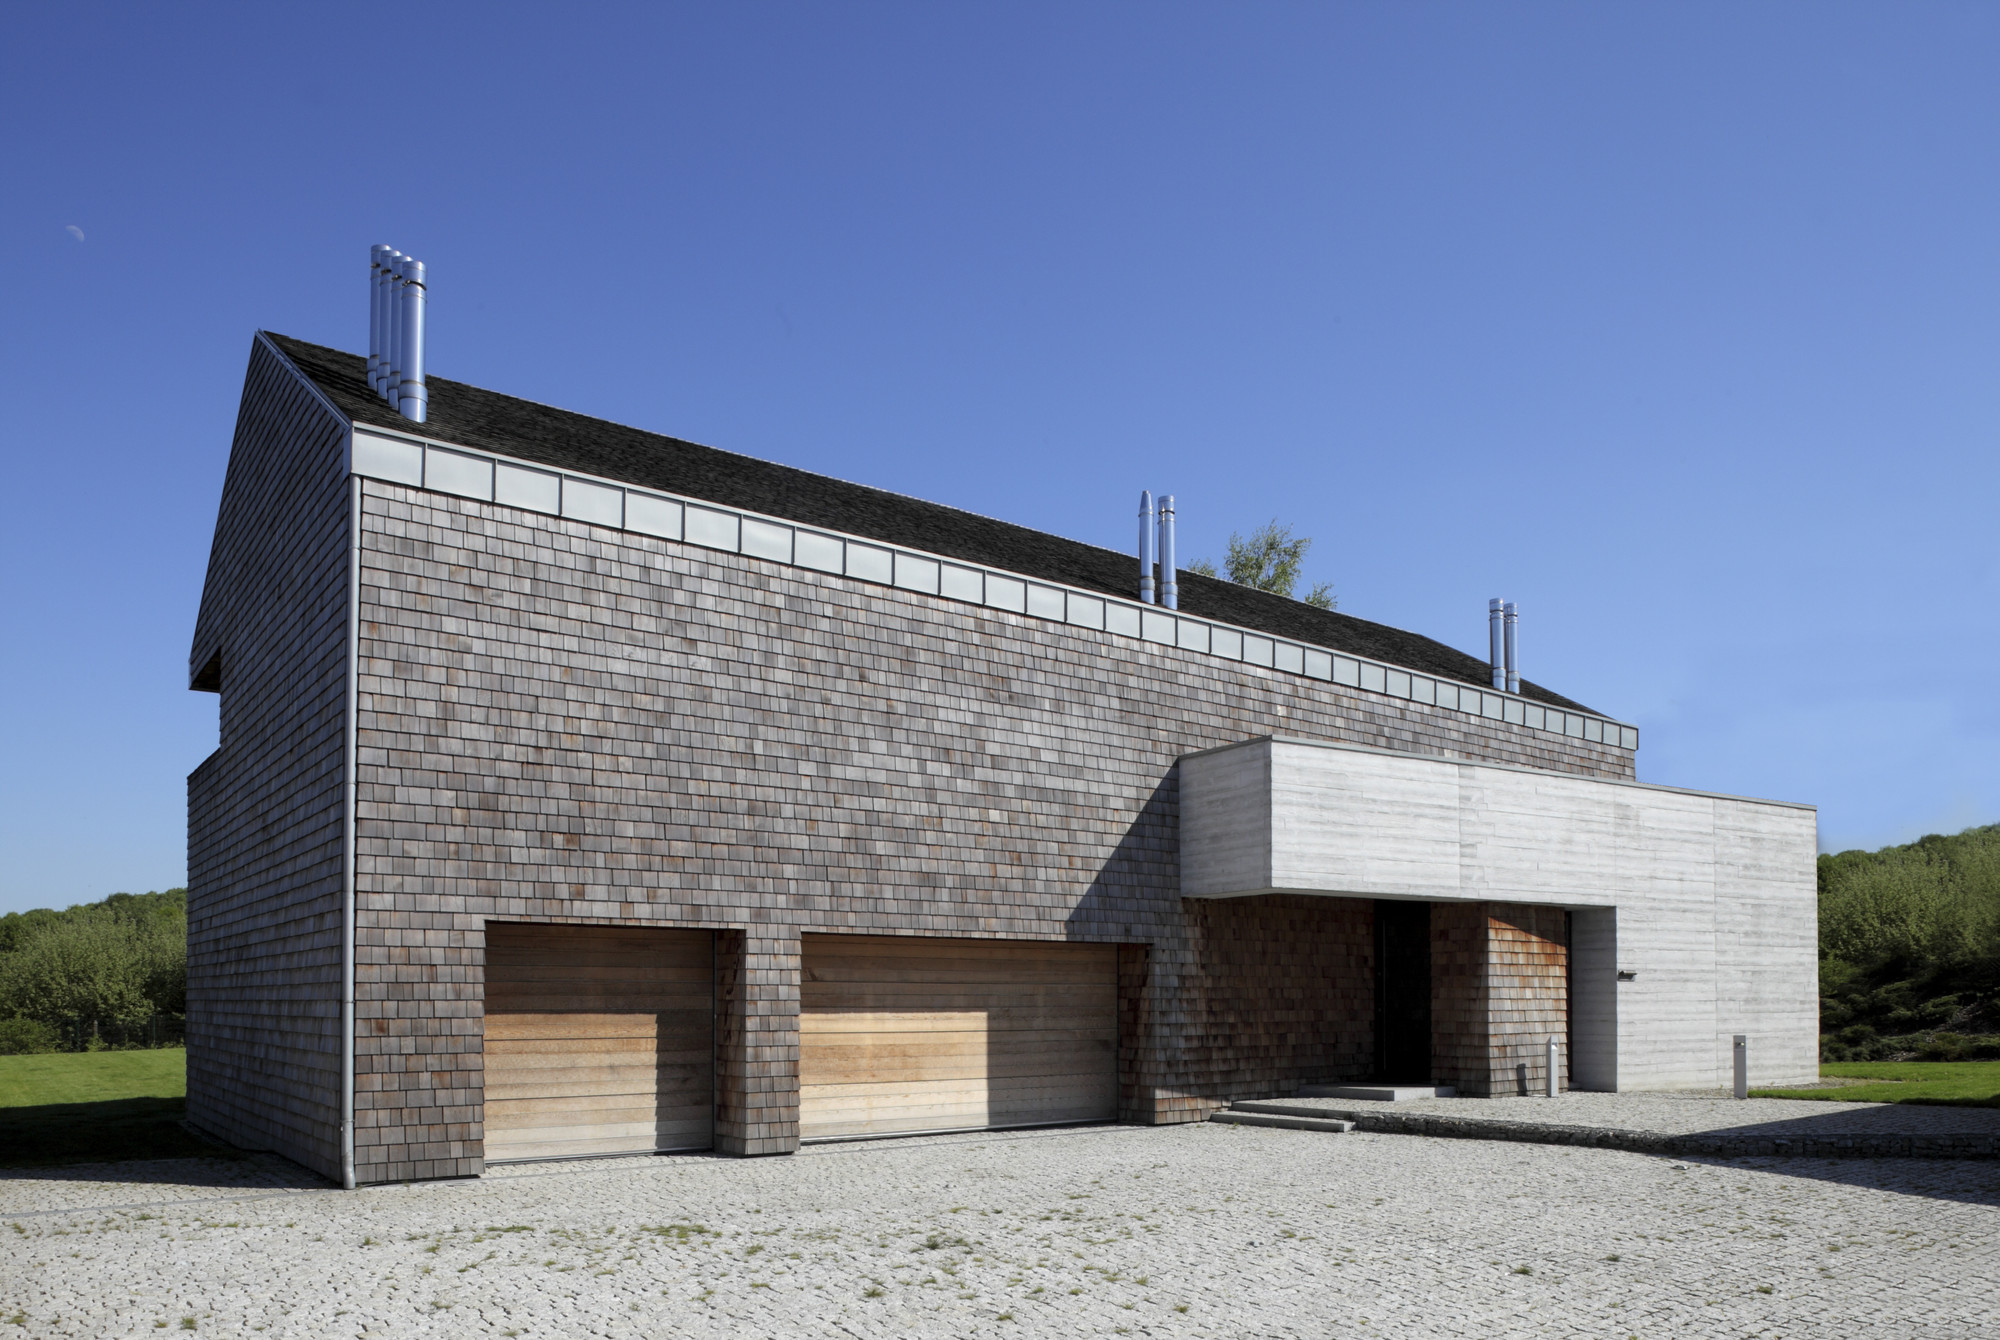 Concrete and Cedar Lath Villa / Biuro Architektoniczne Barycz & Saramowicz, Courtesy of Biuro Architektoniczne Barycz & Saramowicz